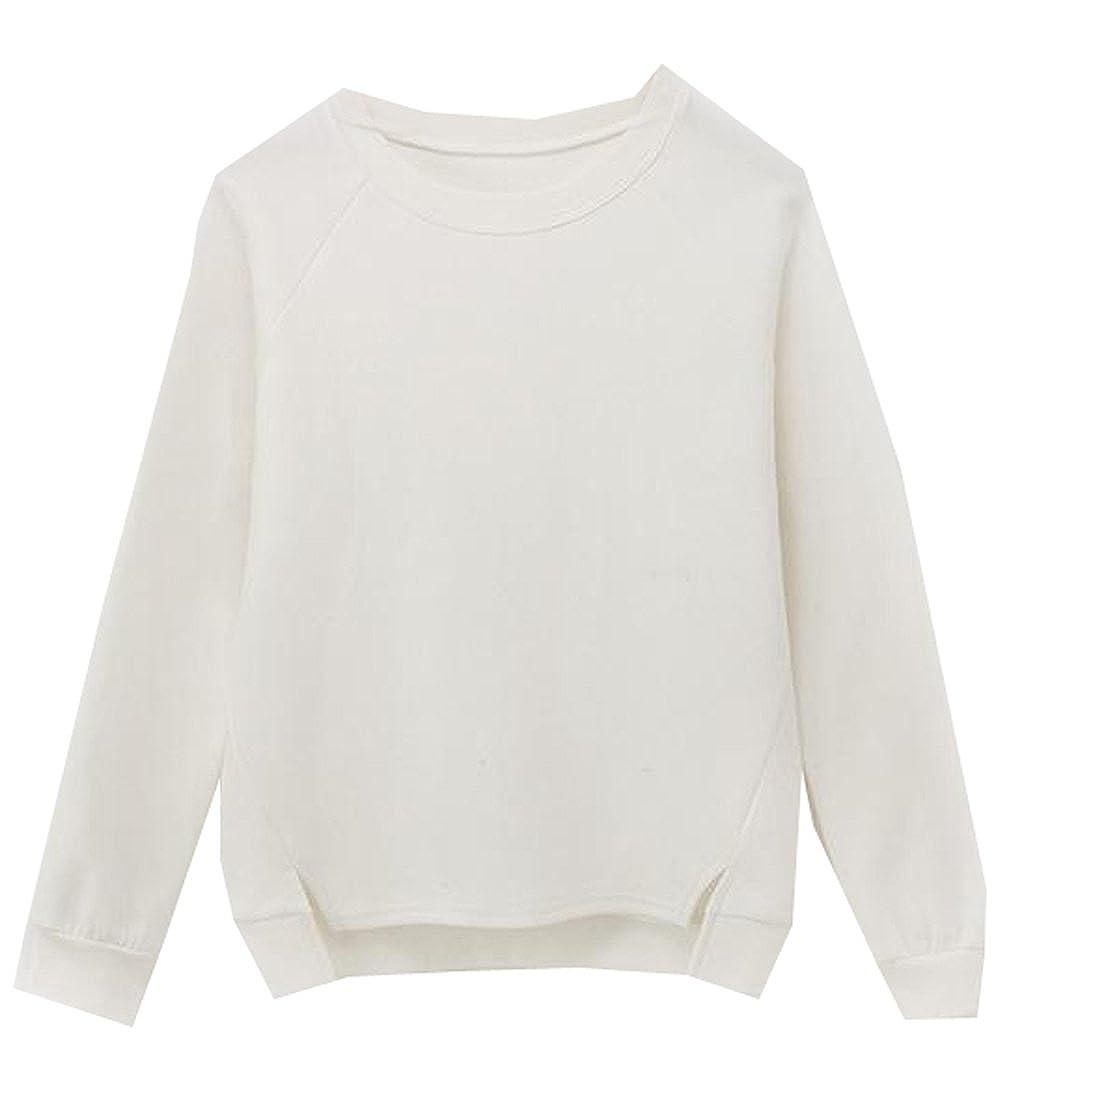 KXP Womens Autumn Hi-Low Pullover Long Raglan Sleeve Crewneck Sweatshirt White L